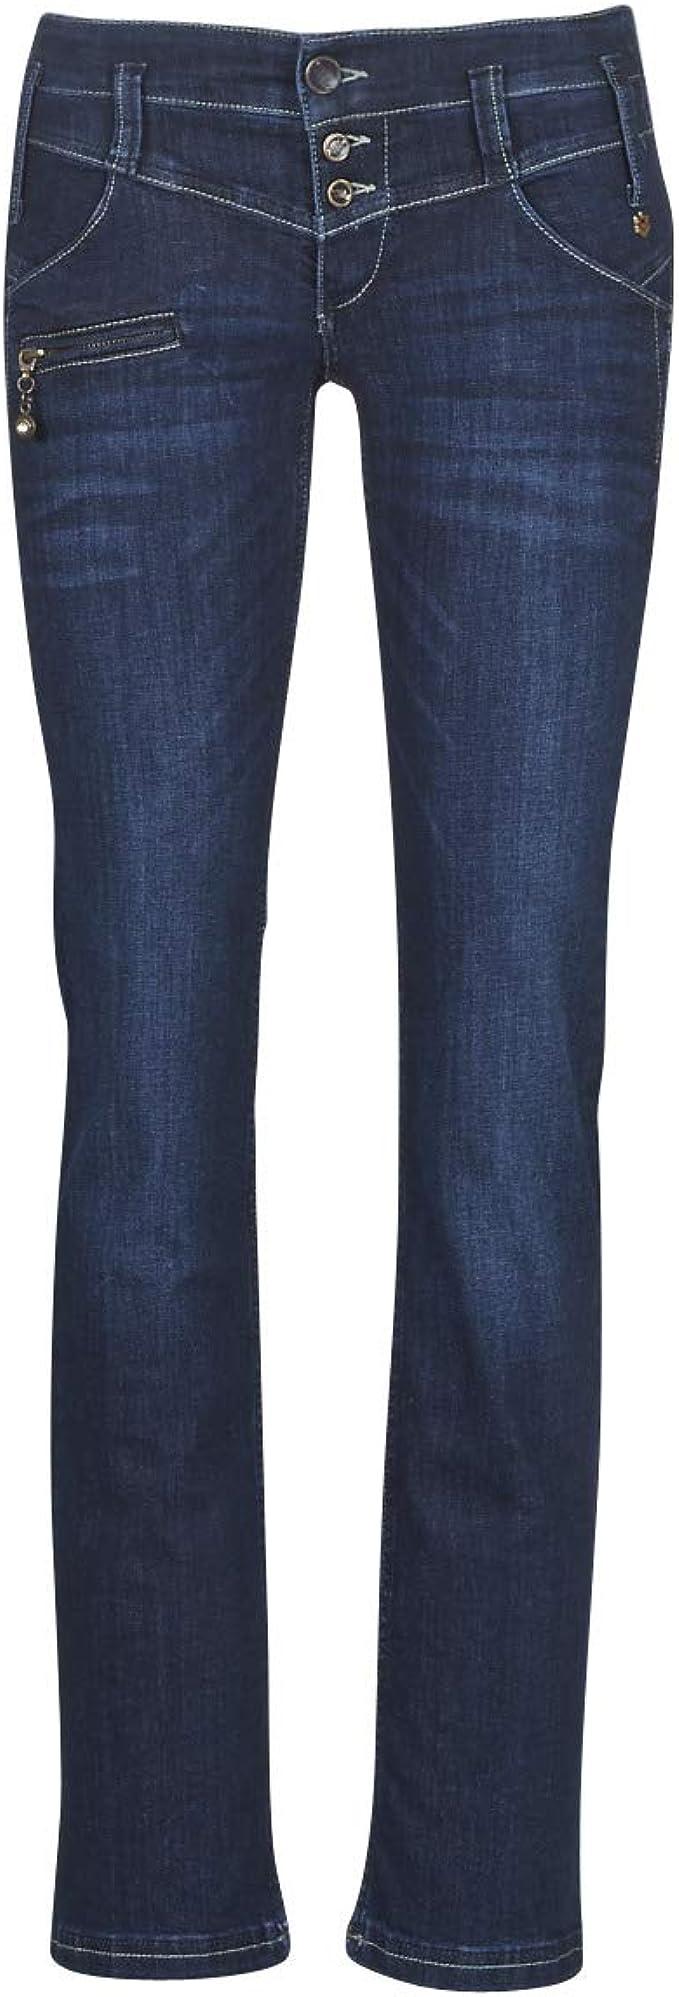 Freeman T Porter Amelie Stretch Denim FIORINO Damen Jeans XS-XL   109,95